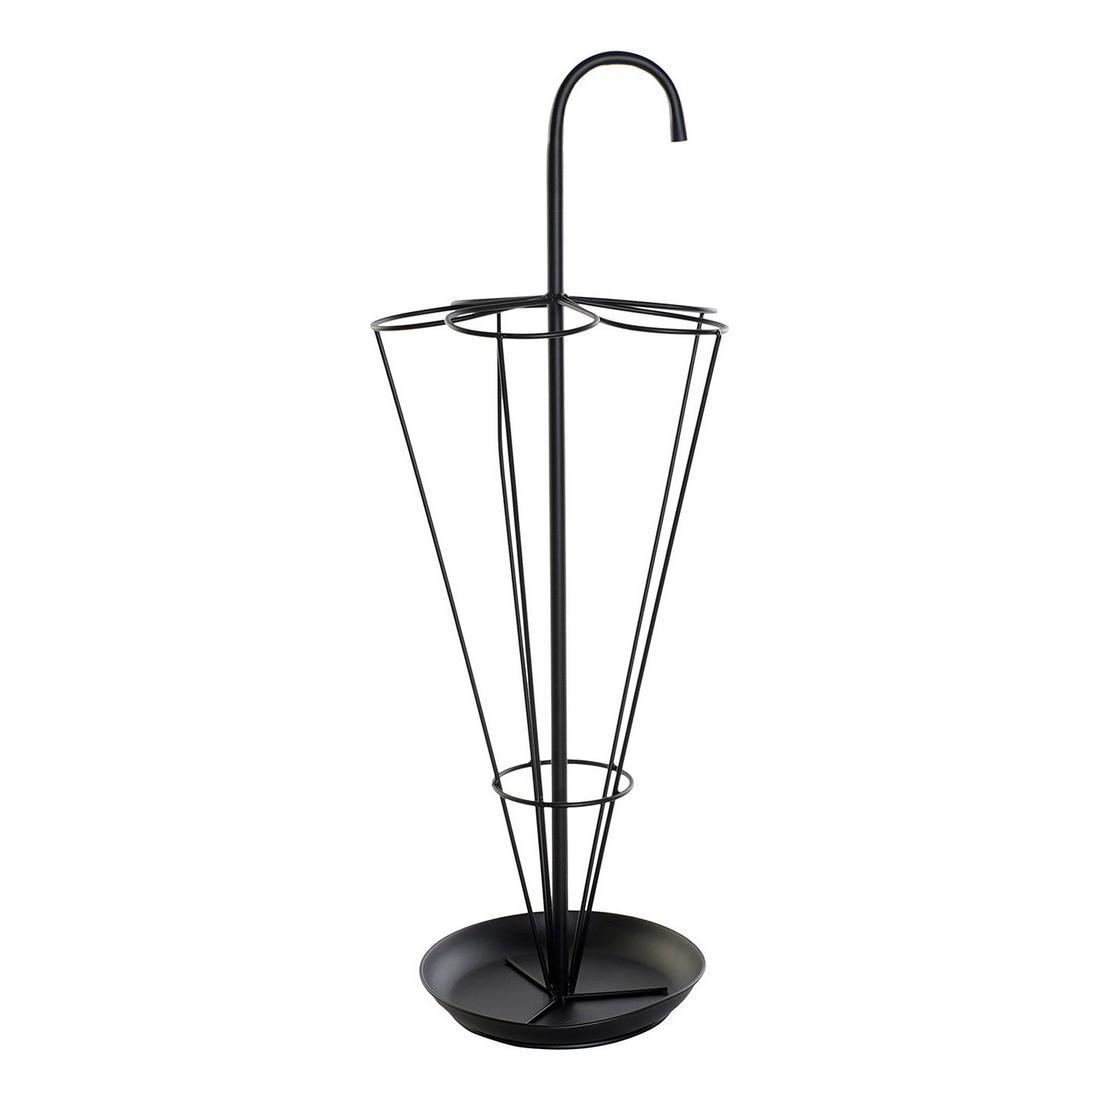 Umbrella stand DKD Home Decor Black Metal (29 x 29 x 80 cm)